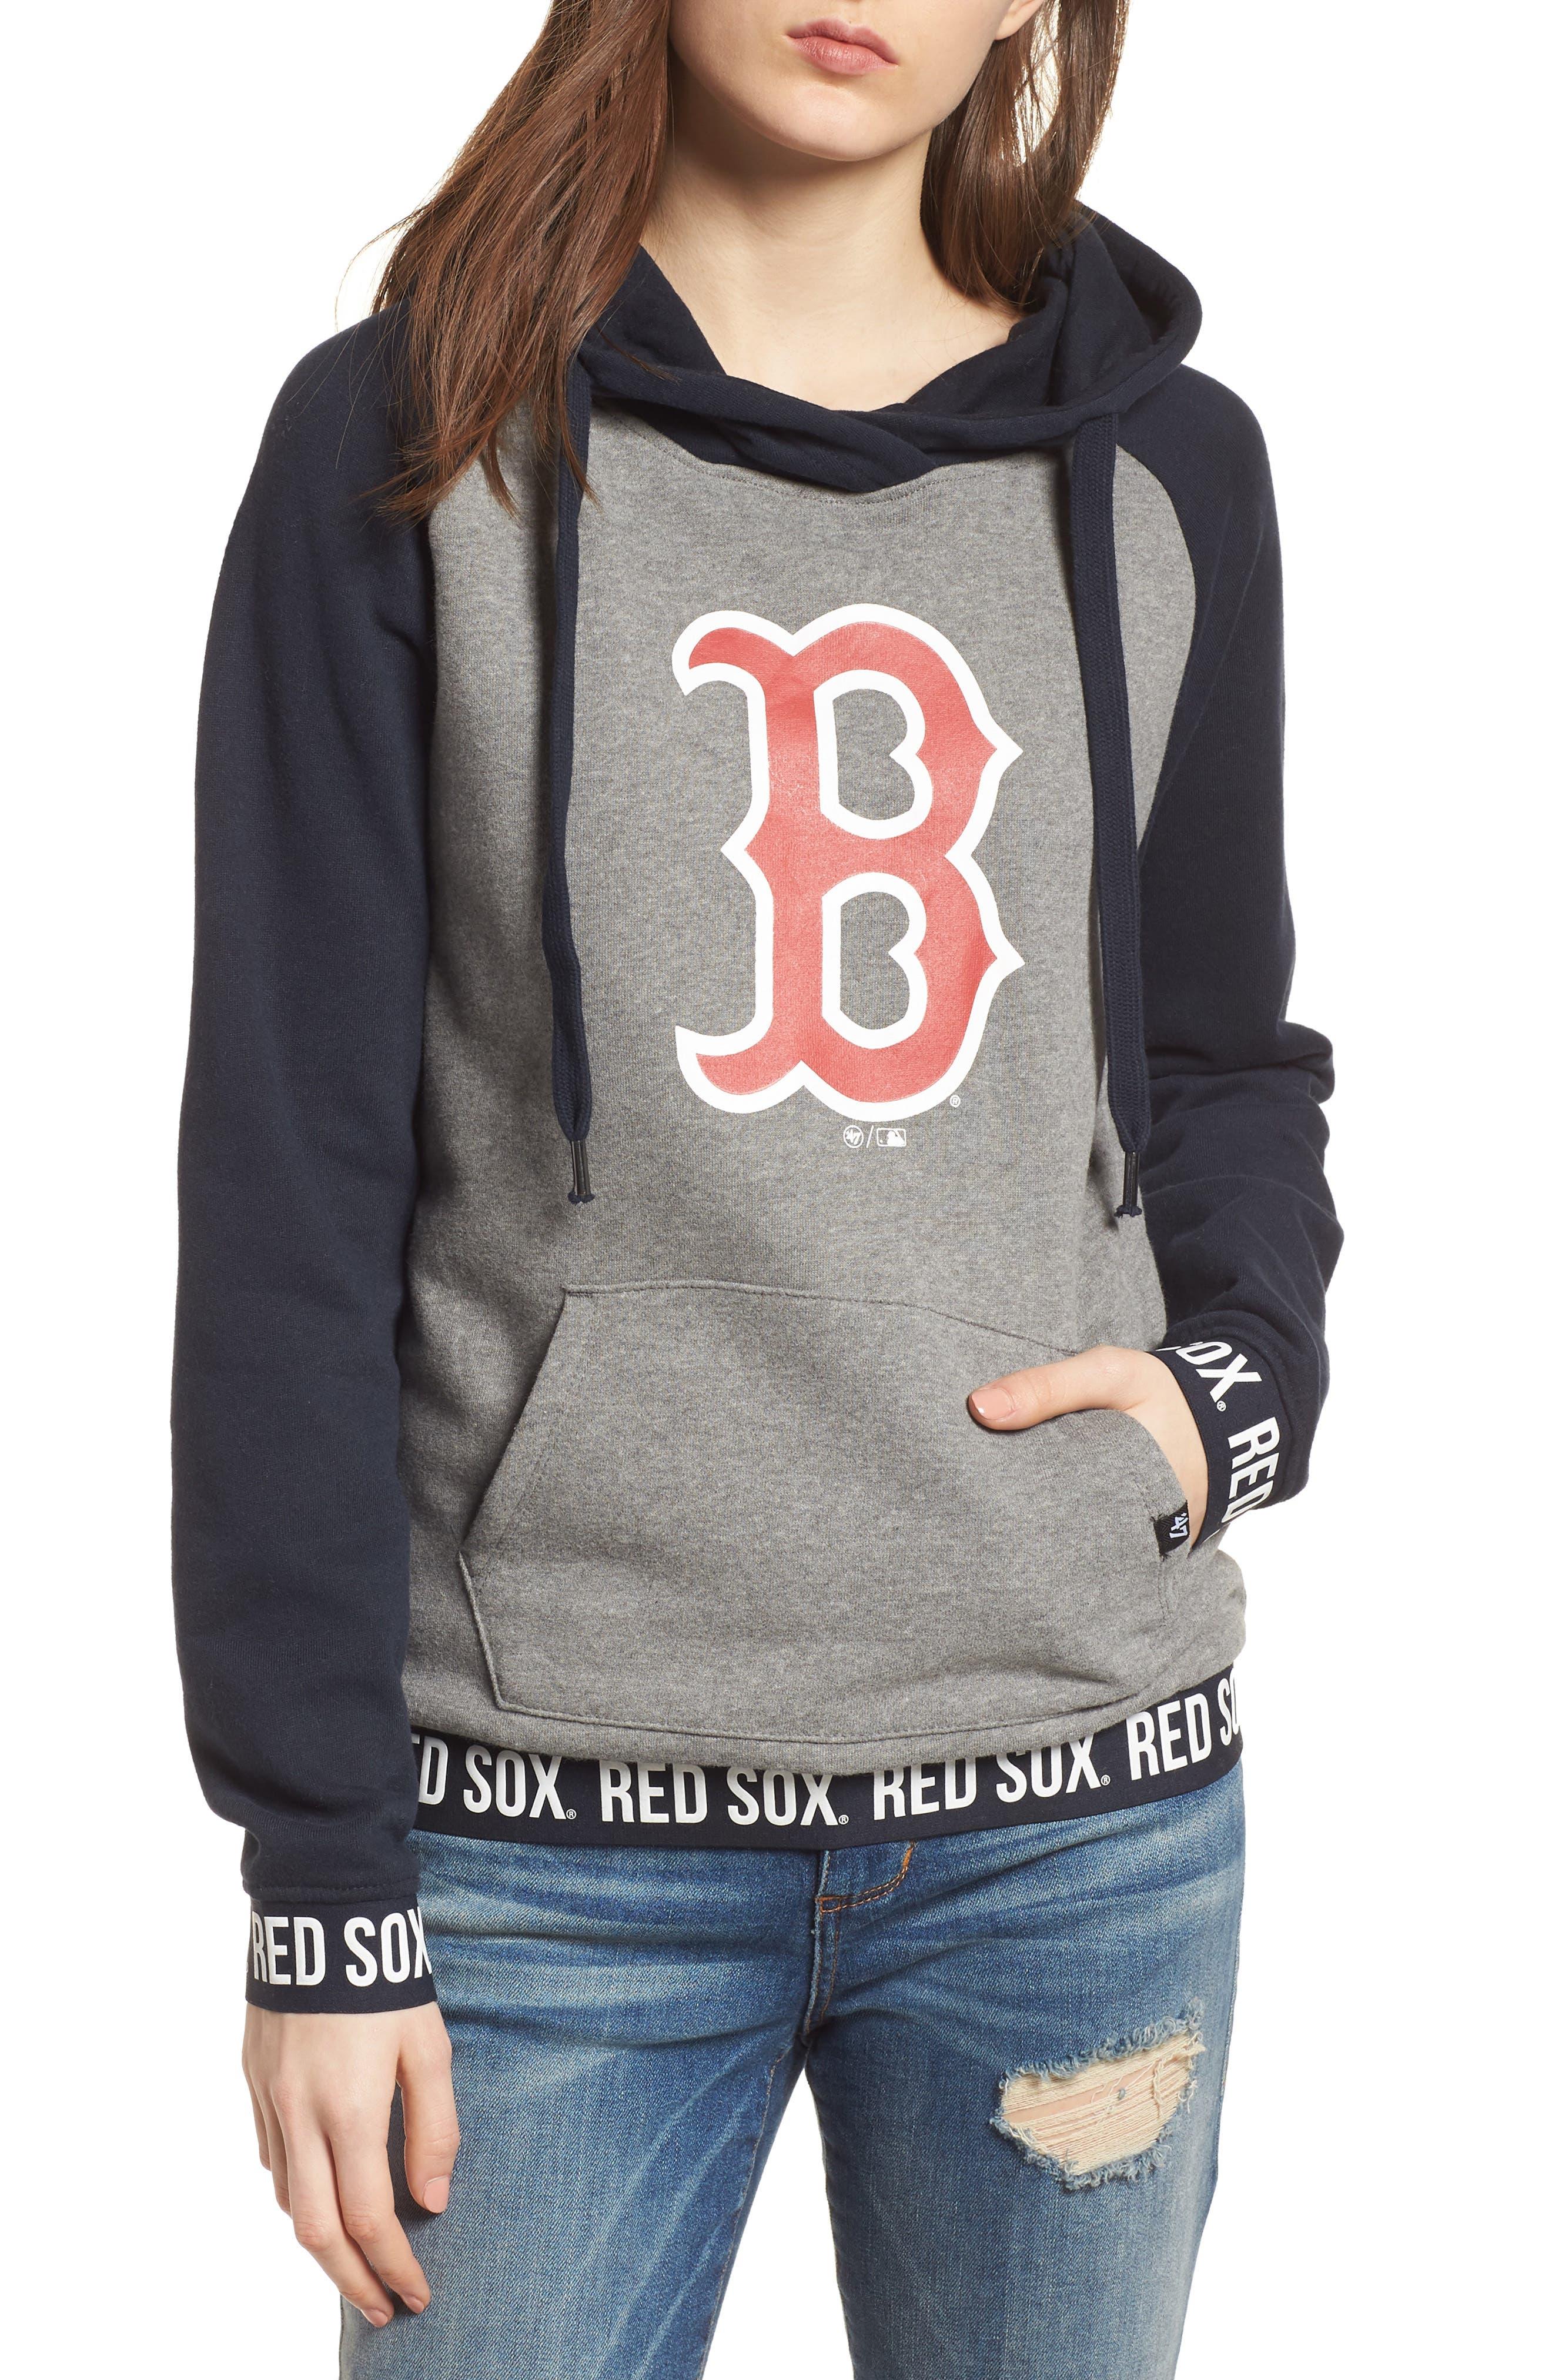 Encore Revolve Boston Red Sox Hoodie,                             Main thumbnail 1, color,                             Vintage Grey